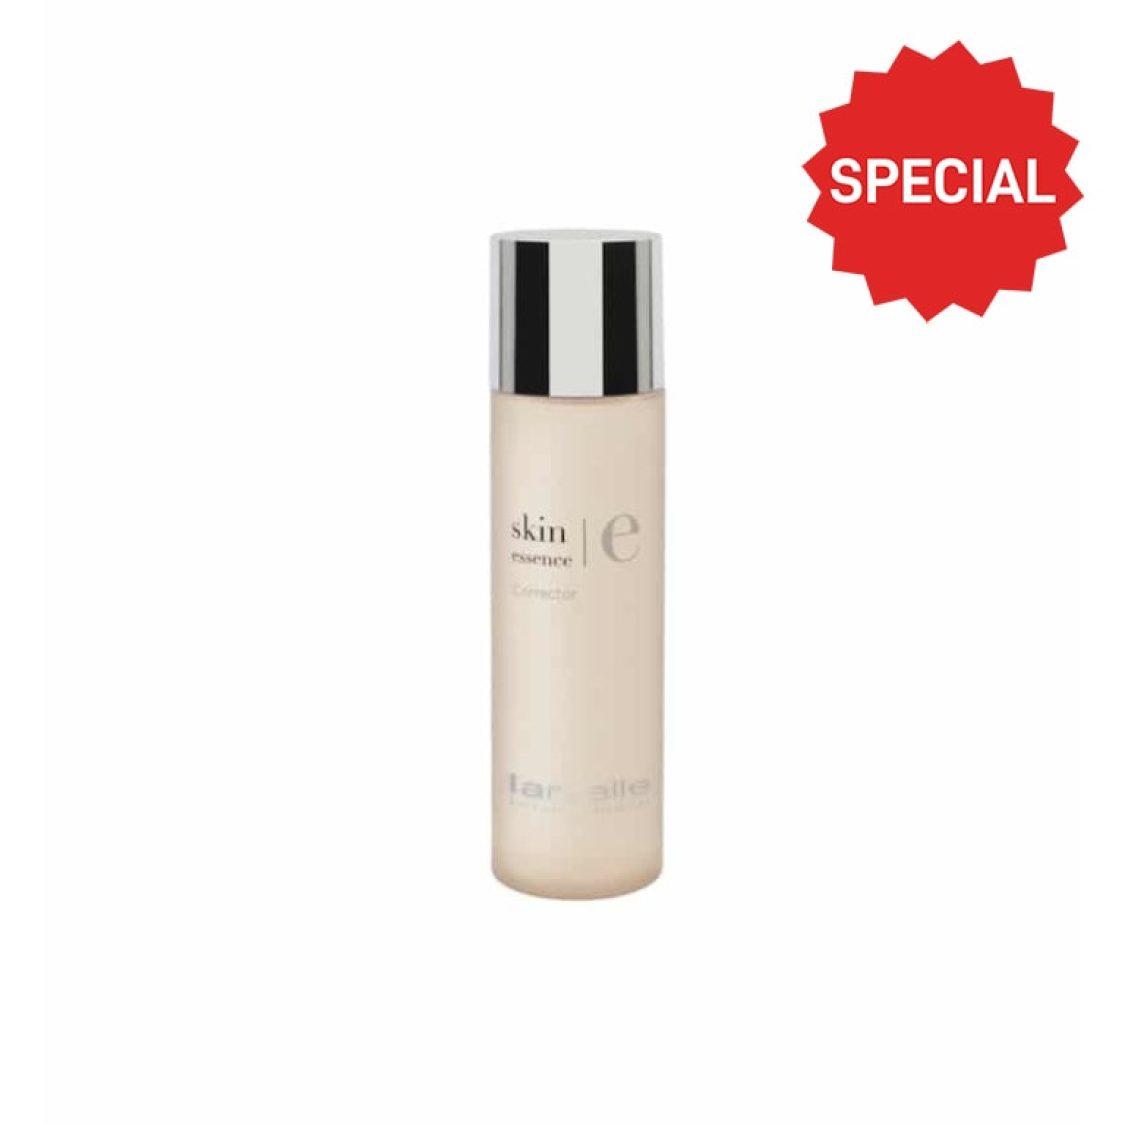 Lamelle - Skin Essence Corrector 150ml